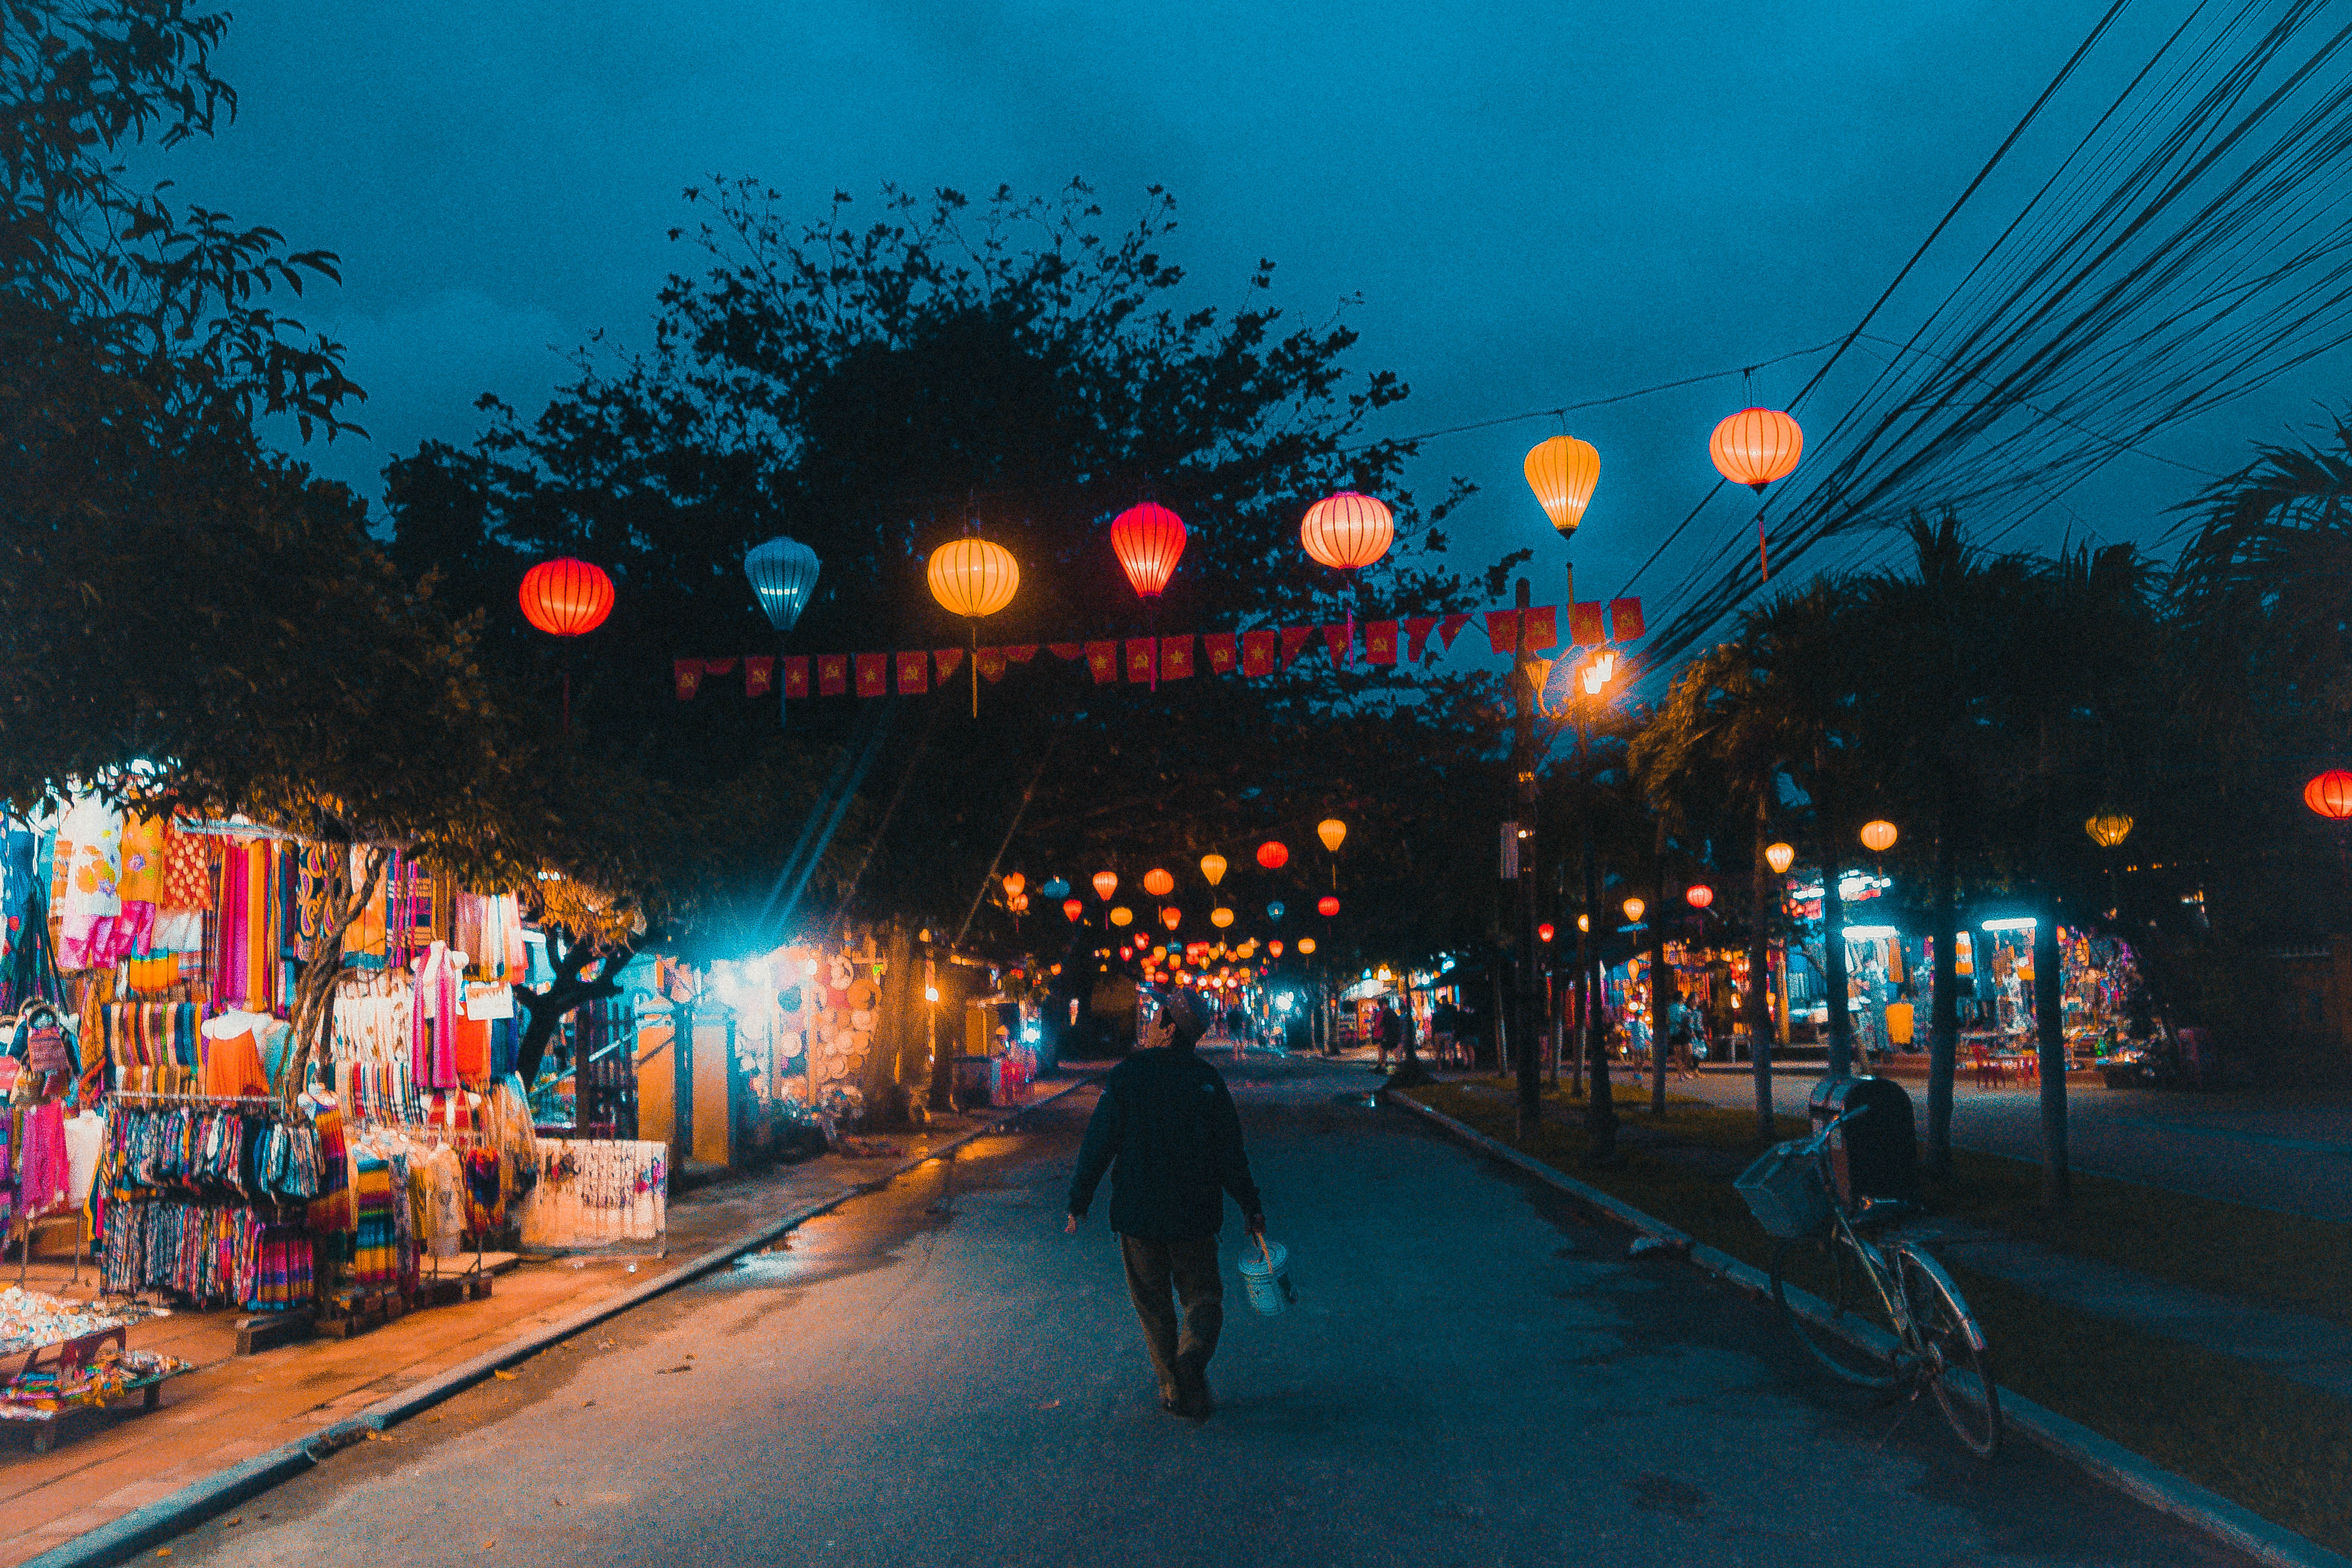 hoi an antler city evening atmospheric asia colours ancient history vietnam